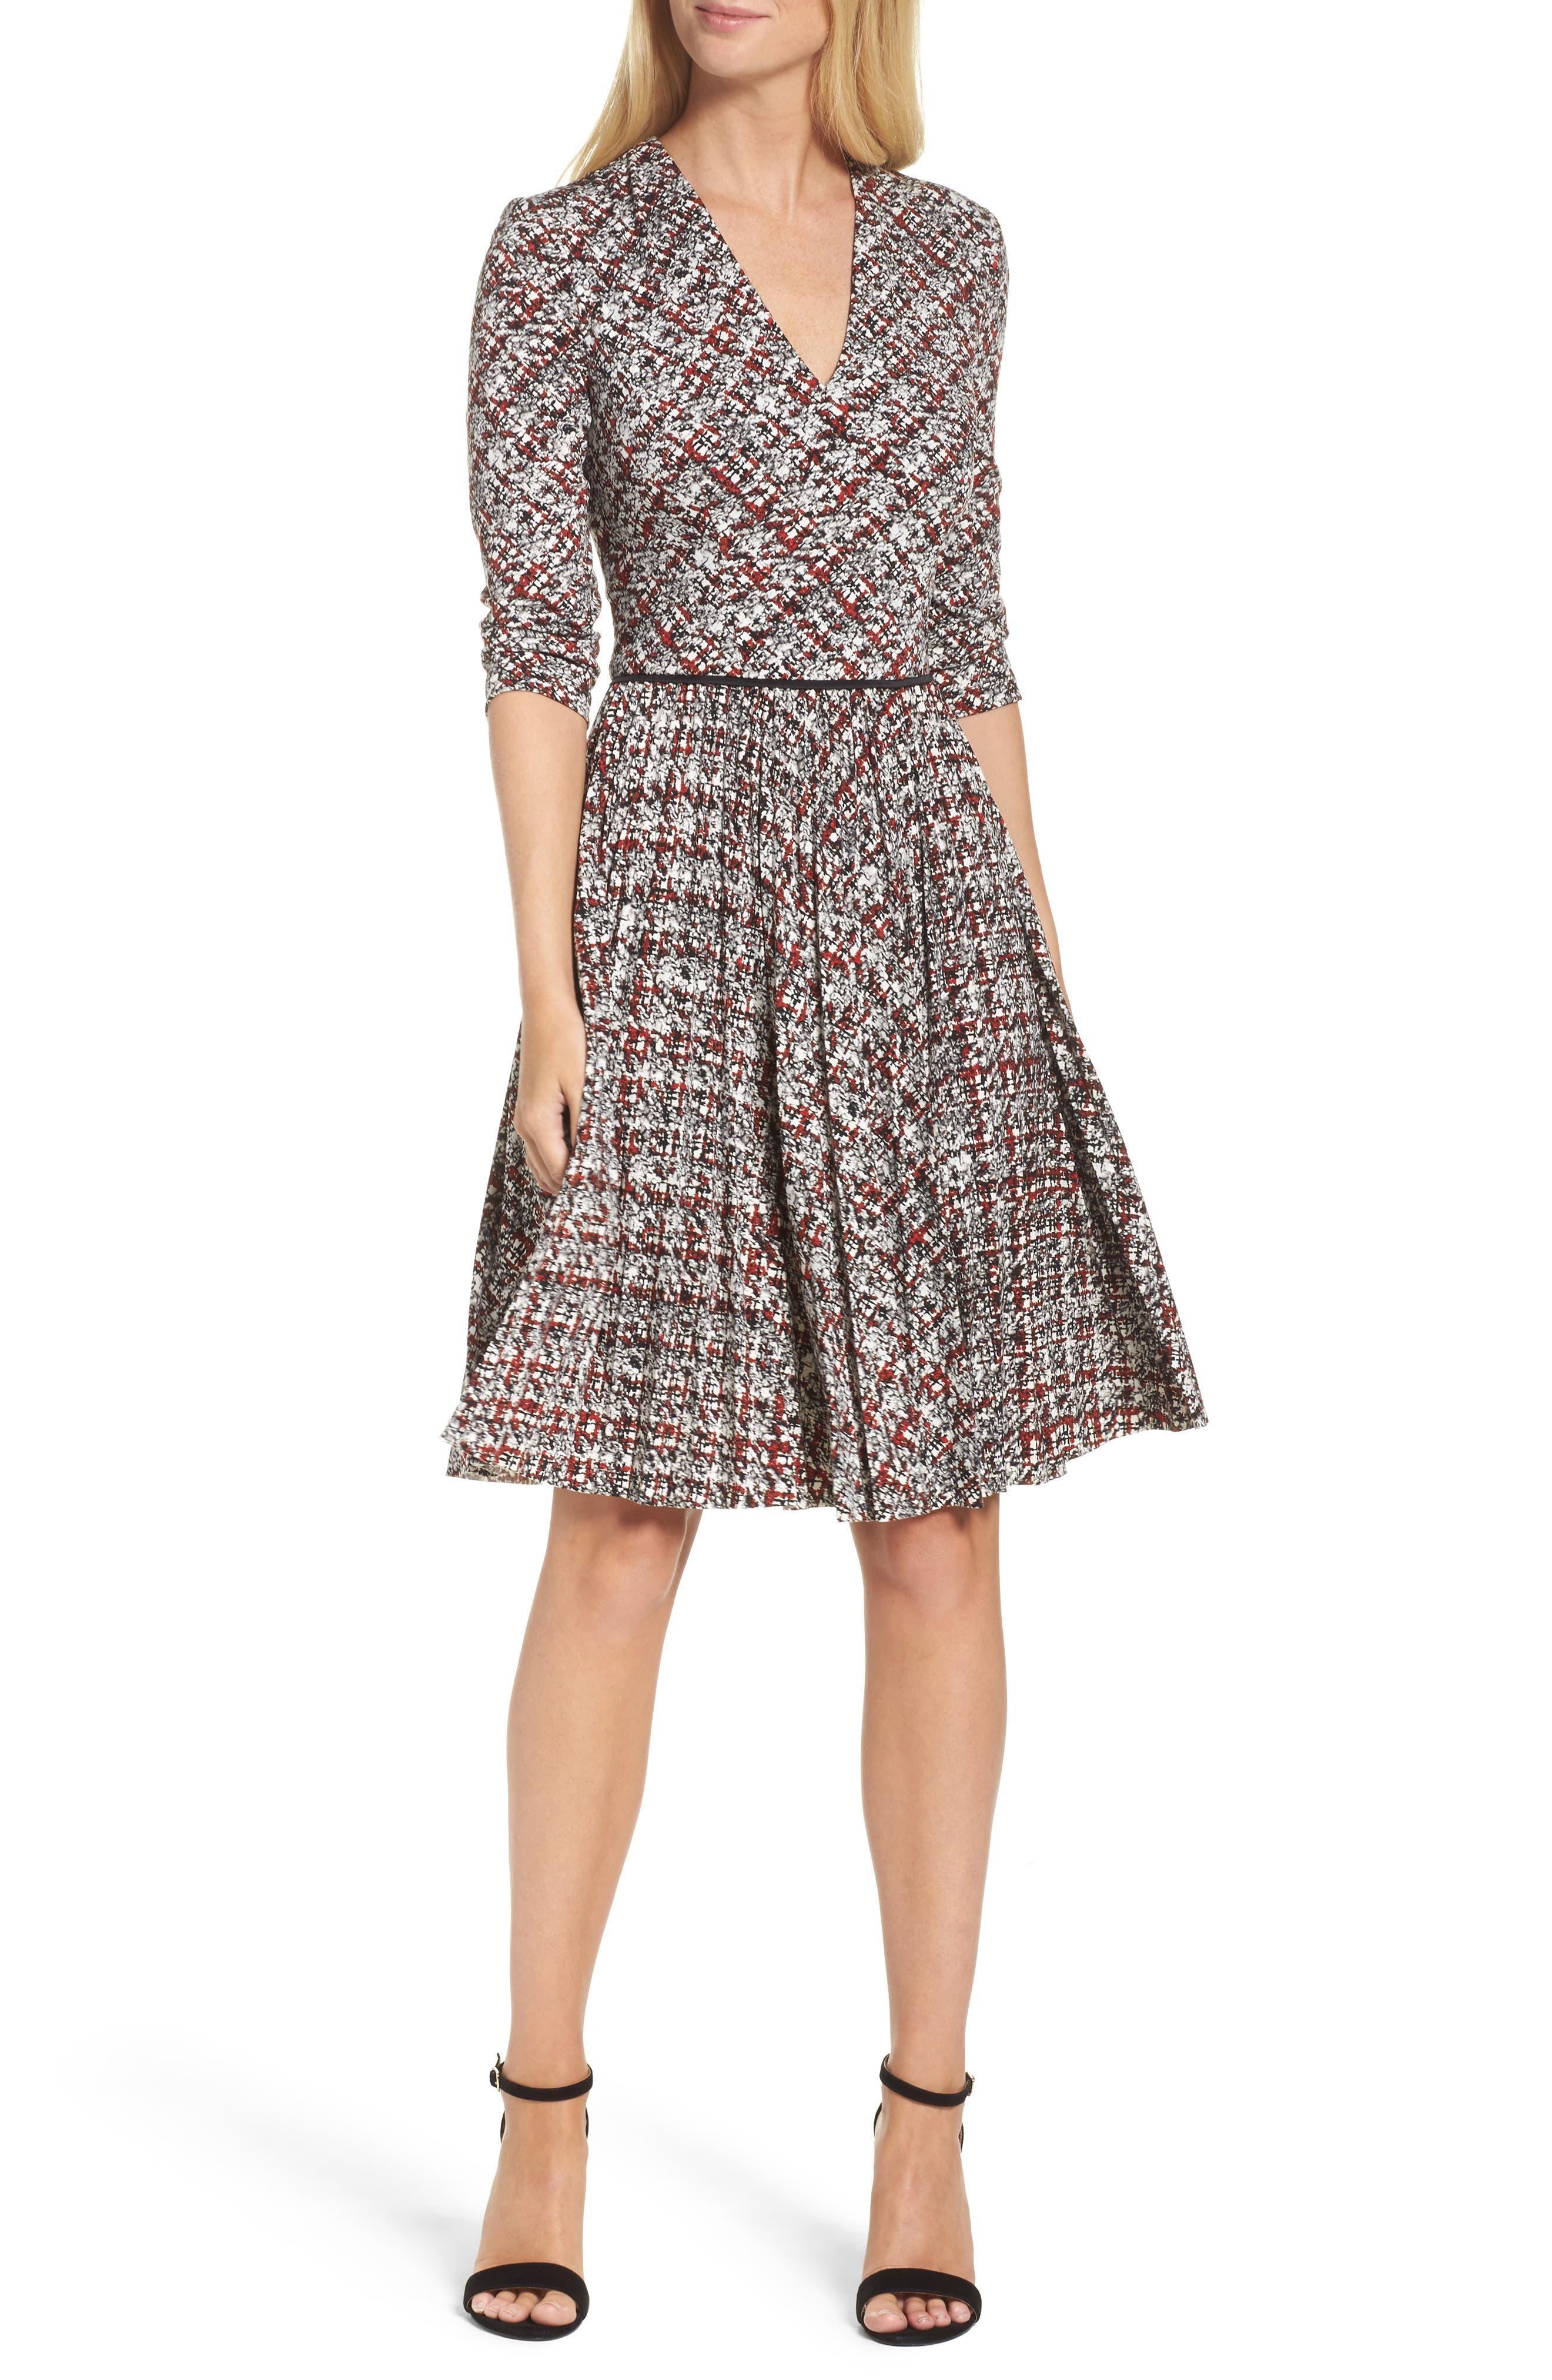 Alternate Image 1 Selected - Maggy London Fit & Flare Dress (Regular & Petite)